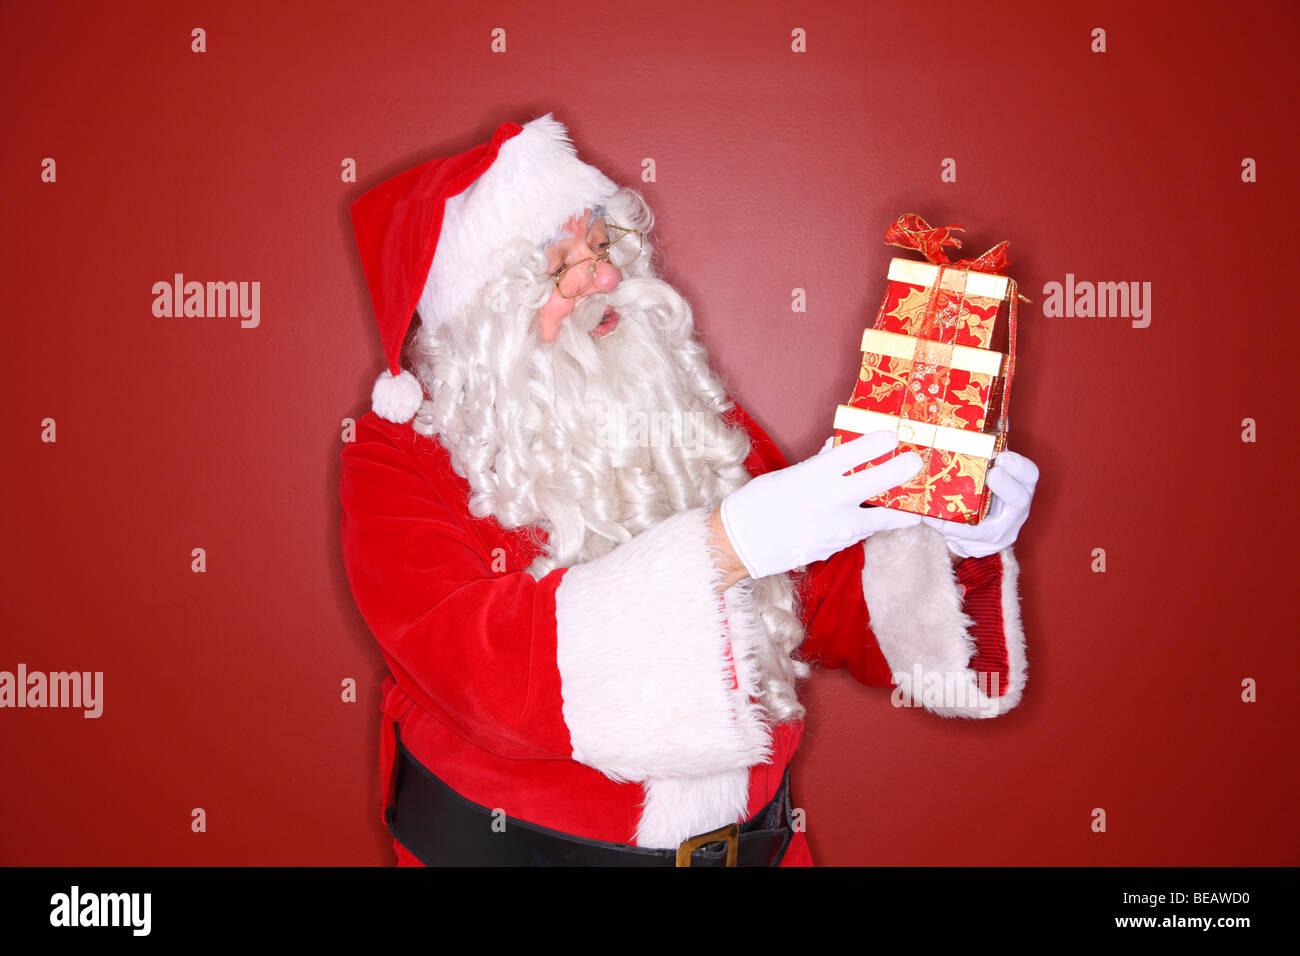 Santa holding present Photo Stock